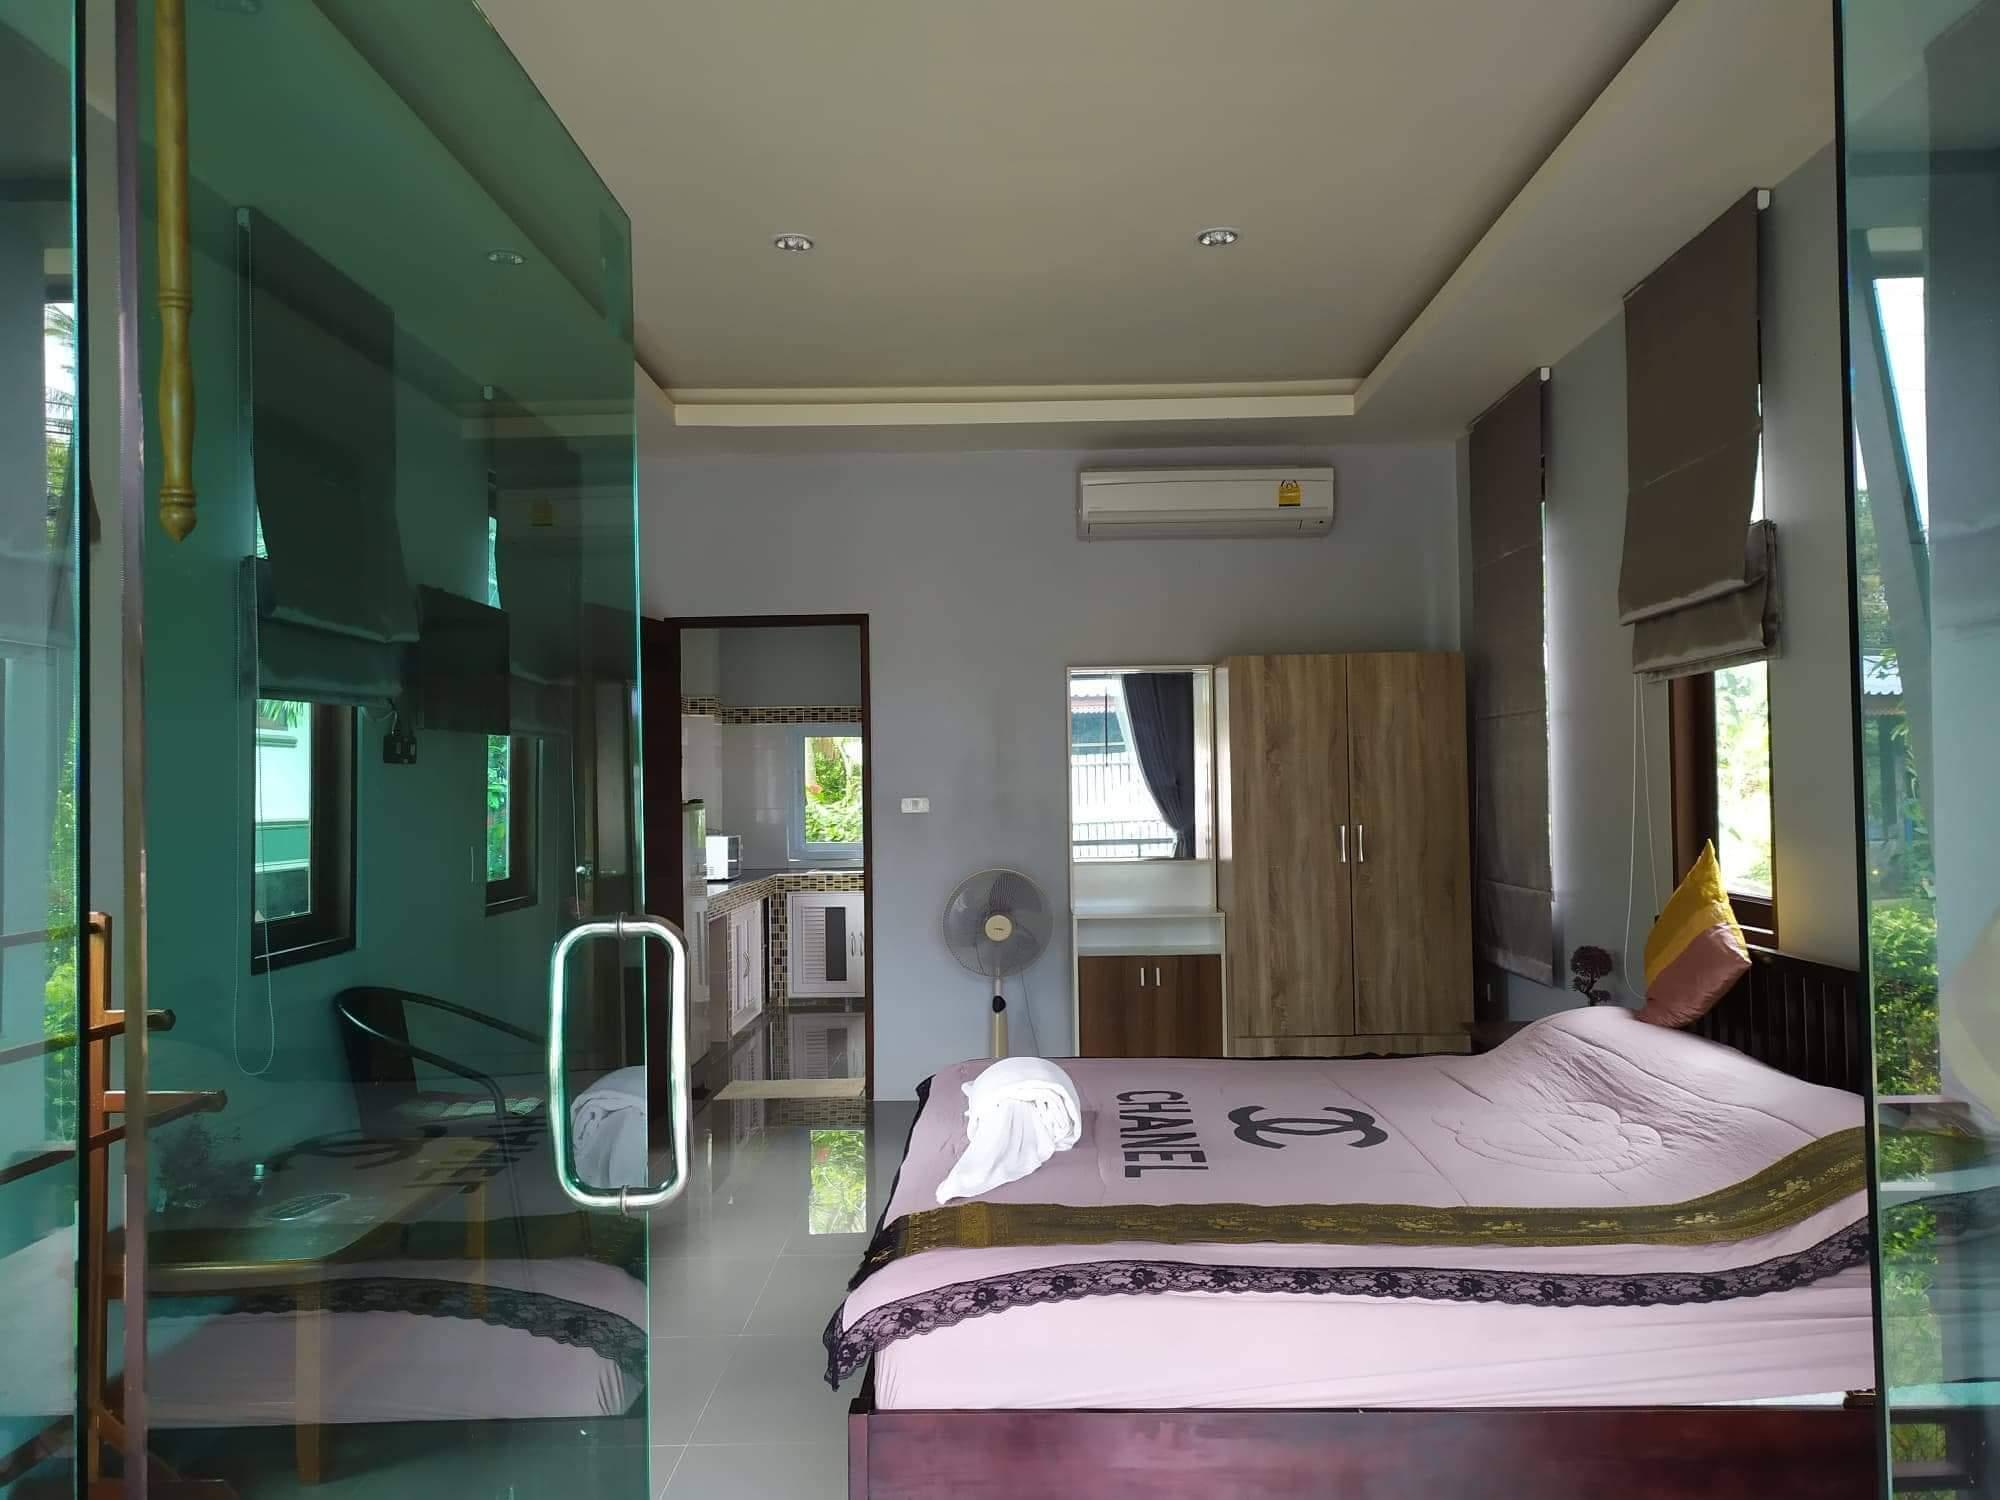 New Modern Style One Bedroom House in Sri Thanu บ้านเดี่ยว 1 ห้องนอน 1 ห้องน้ำส่วนตัว ขนาด 100 ตร.ม. – หาด เจ้า เภา